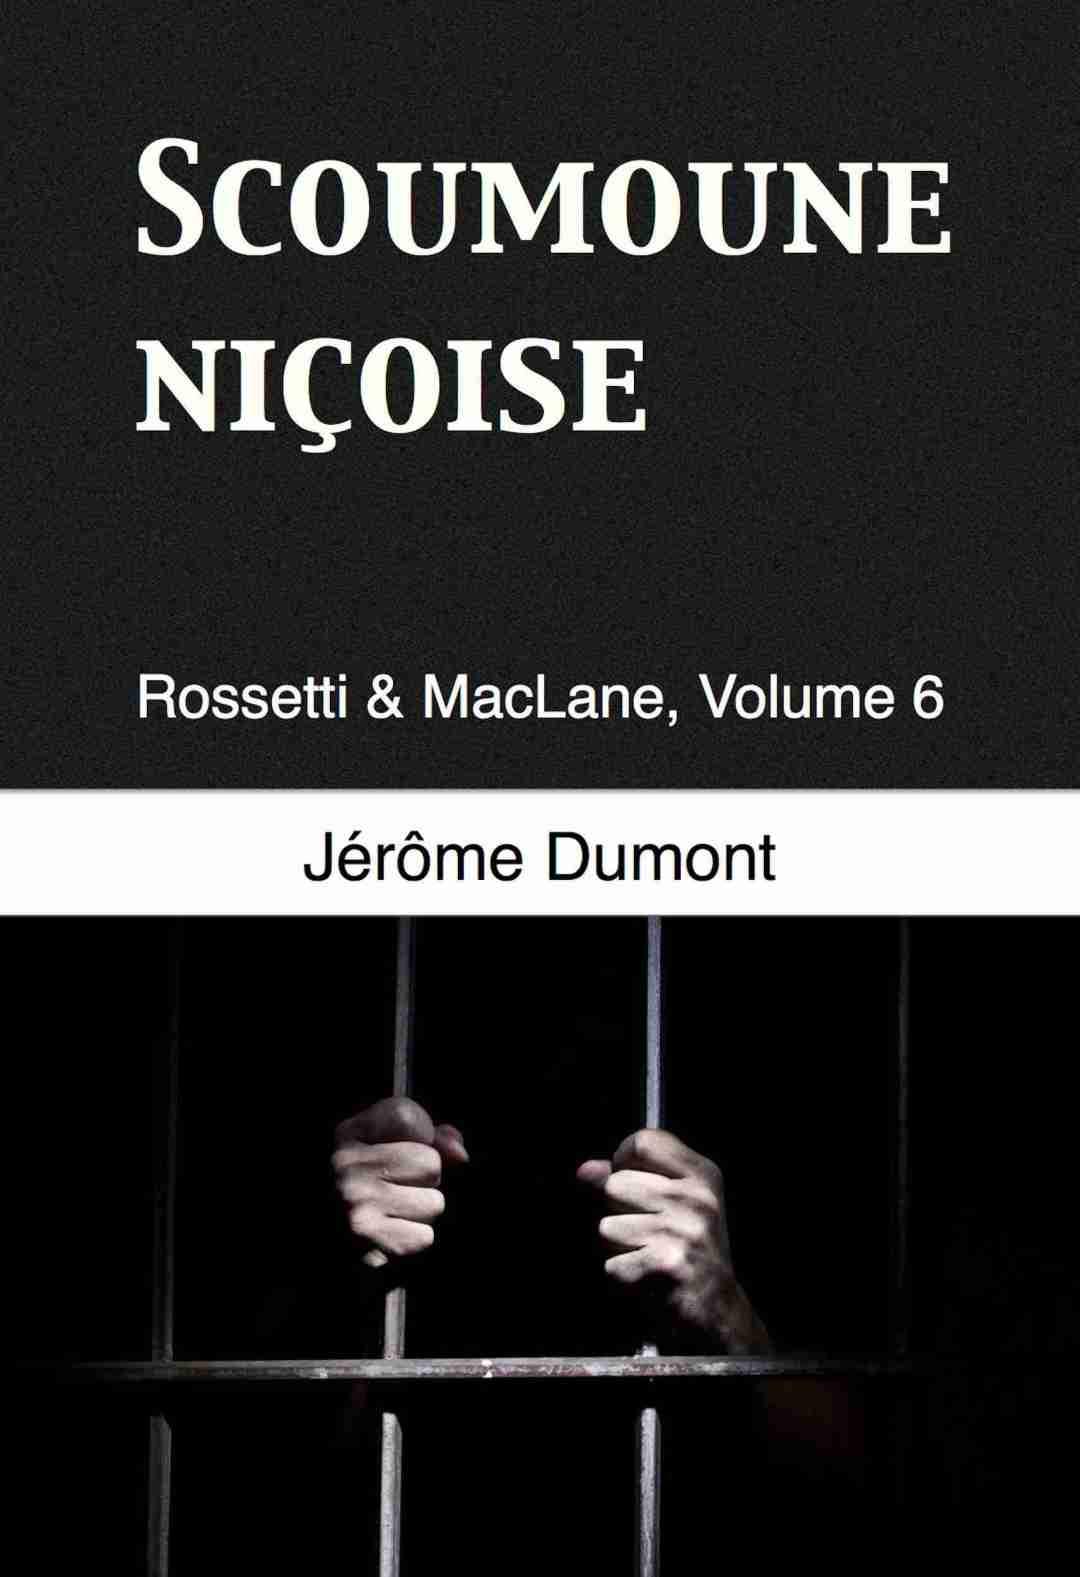 scoumoune-nicoise-rossetti-malane-6